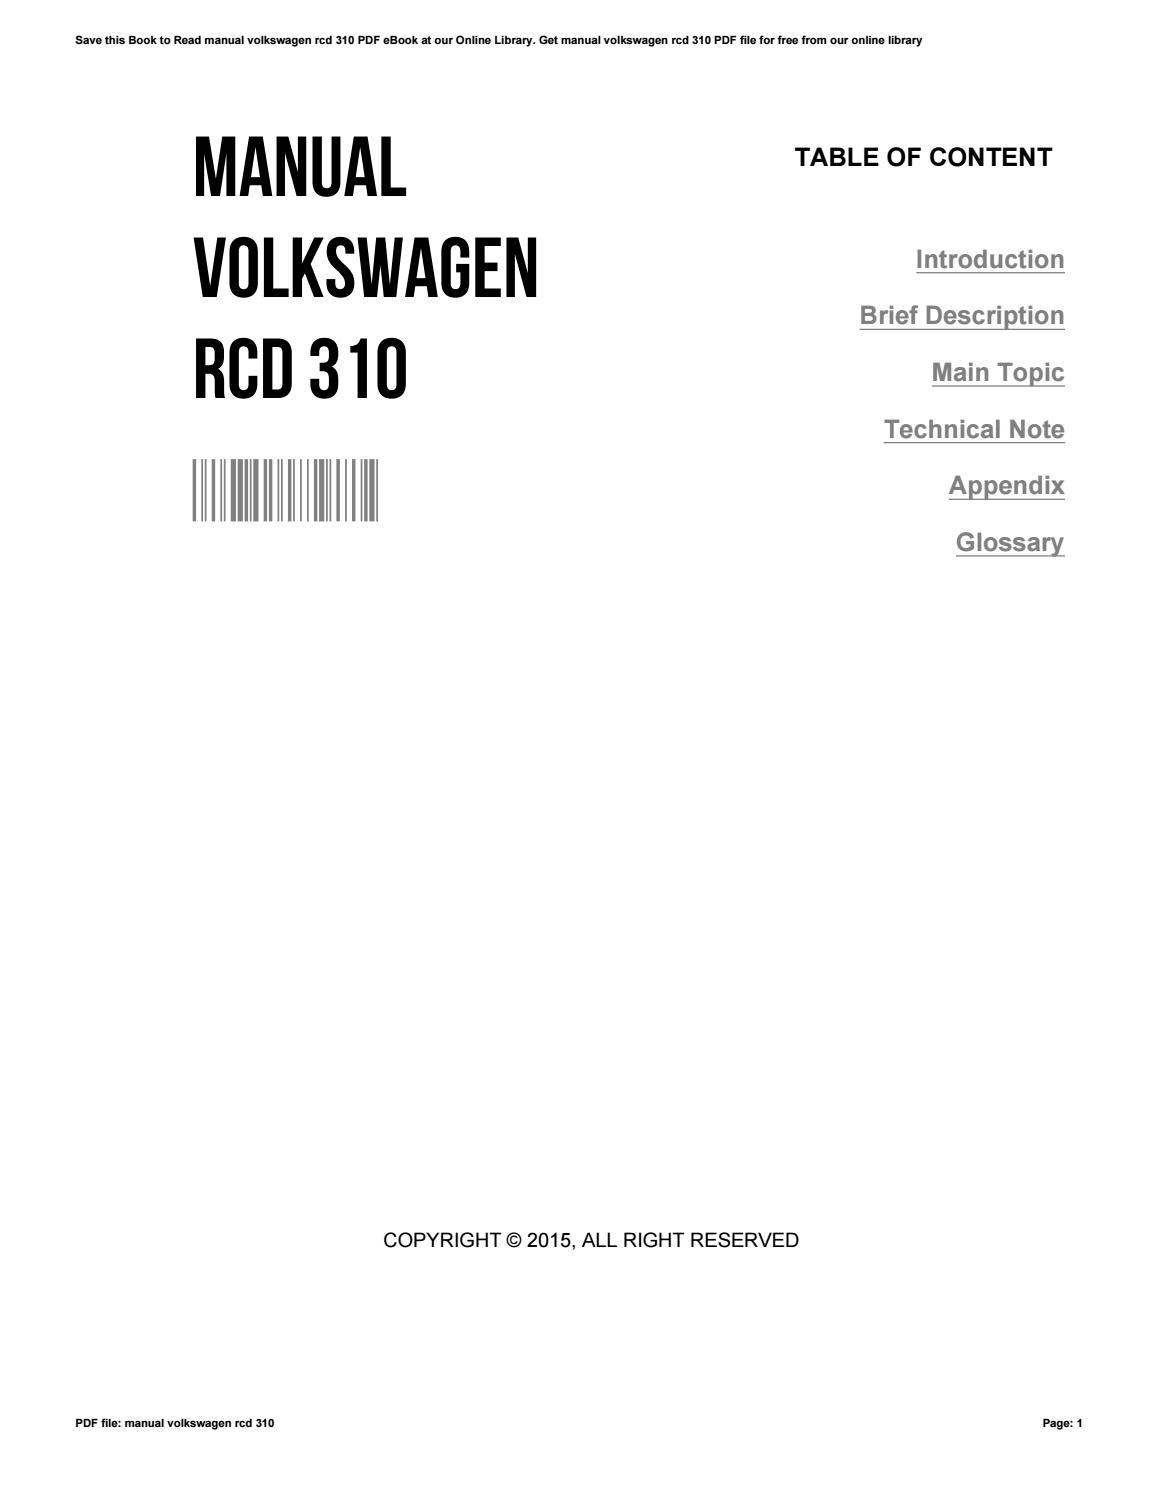 Vw Rcd 310 Wiring Diagram Manual Volkswagen By Lorena Issuurhissuu